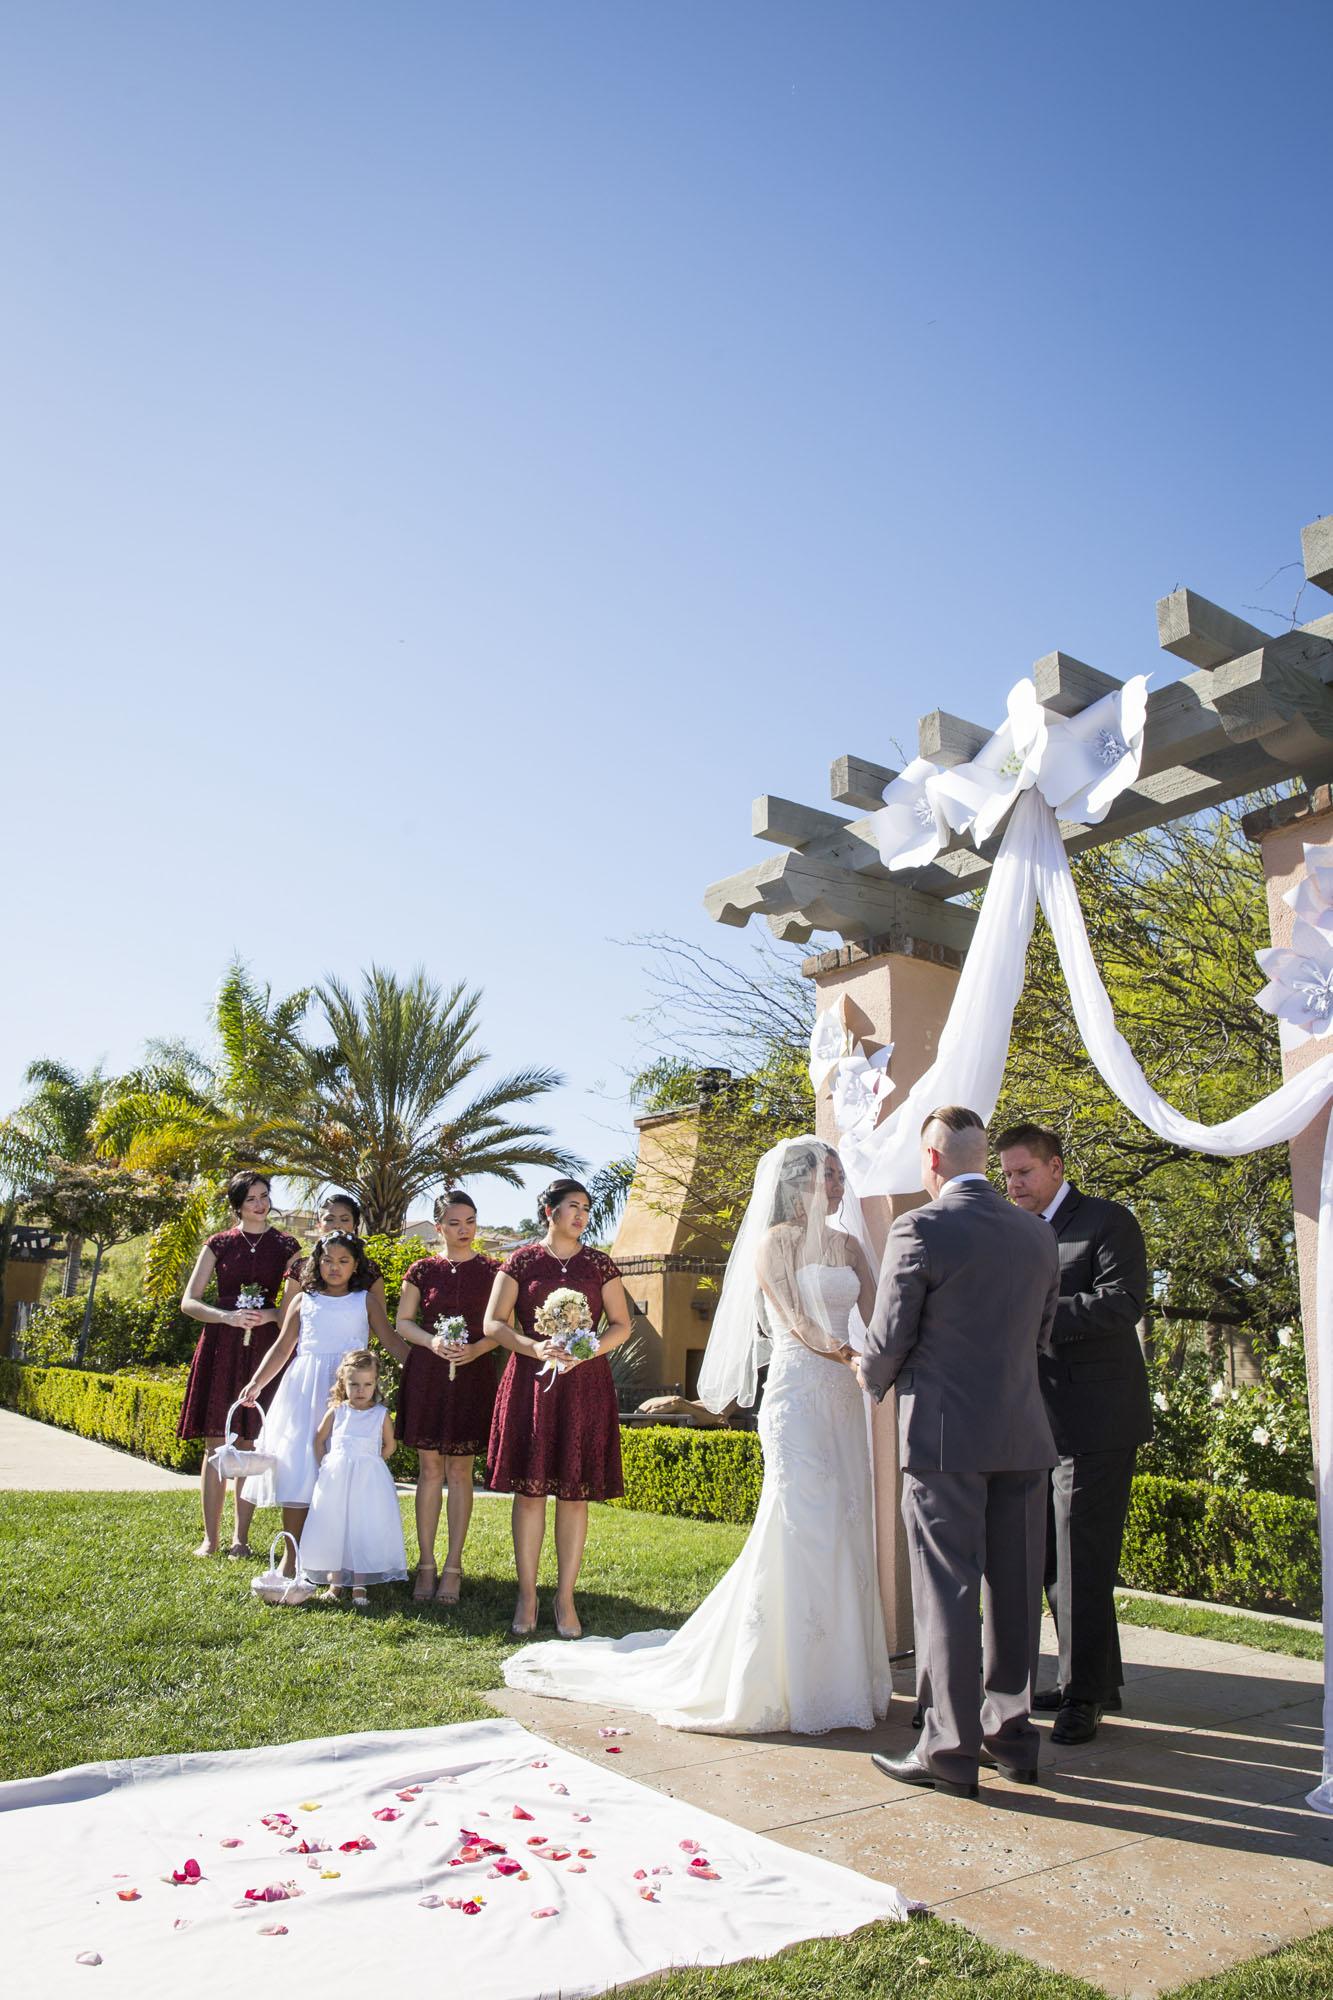 Outdoor archway ceremony